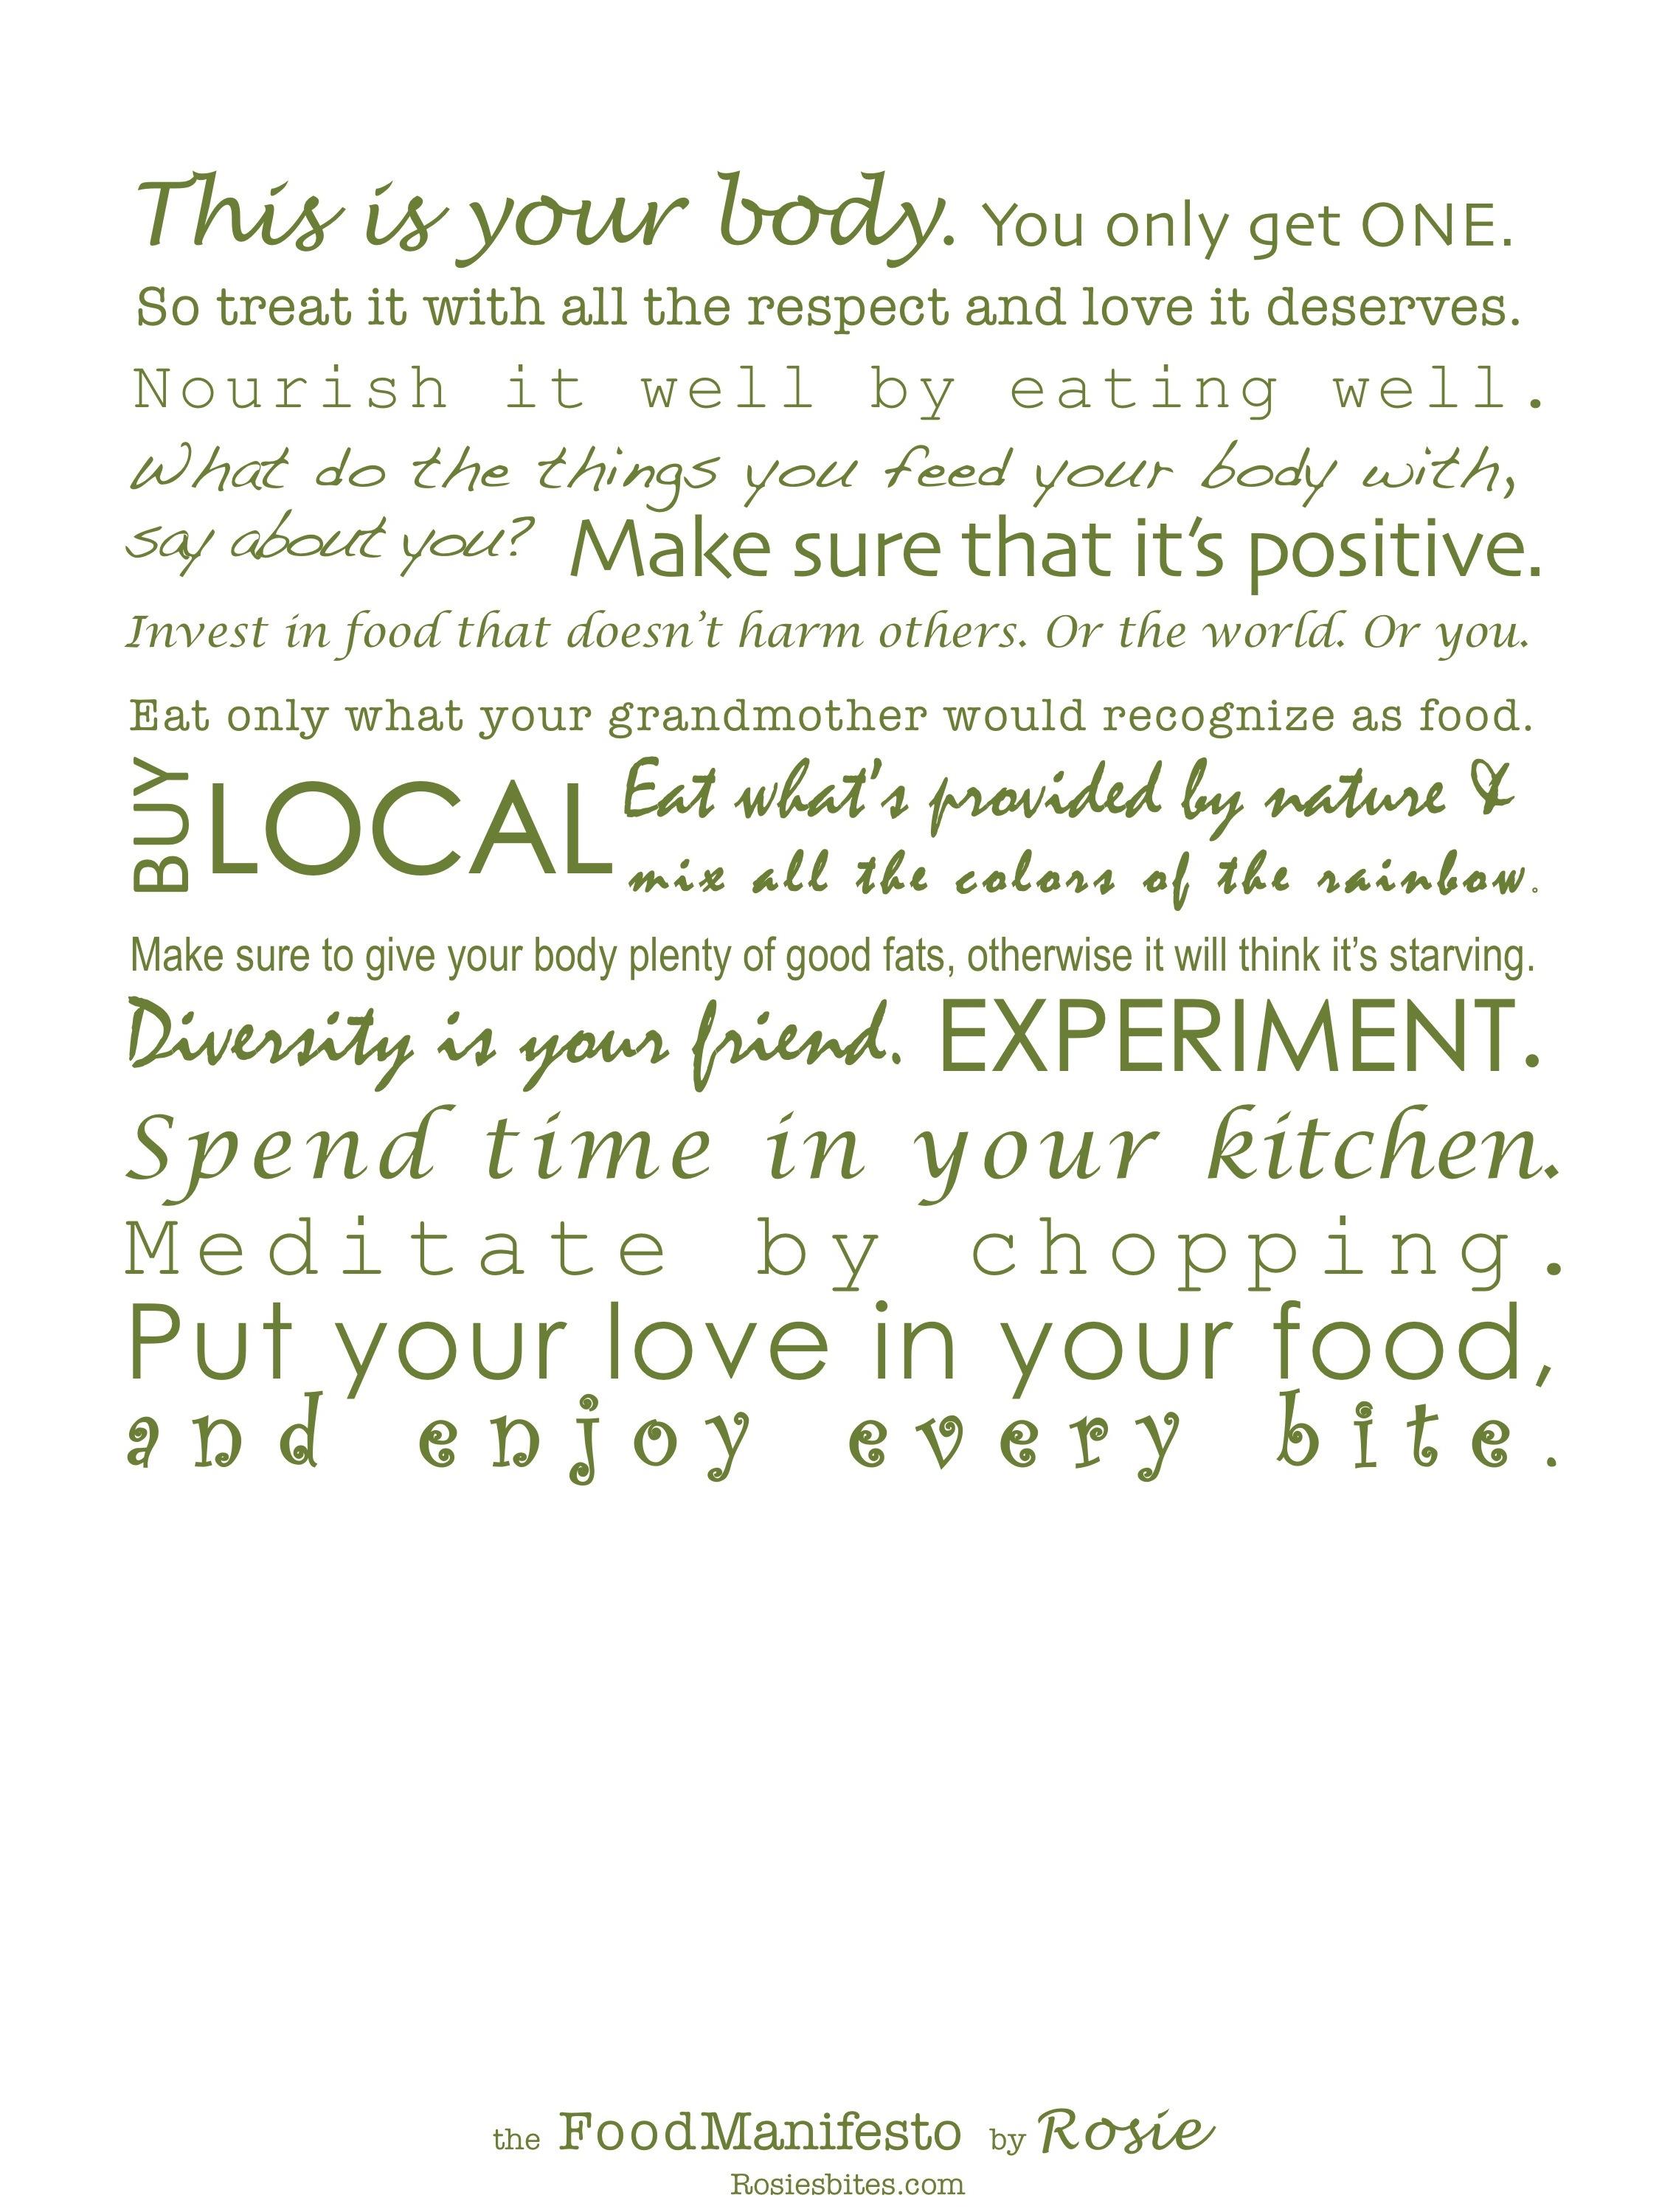 Rosie's Food Manifesto